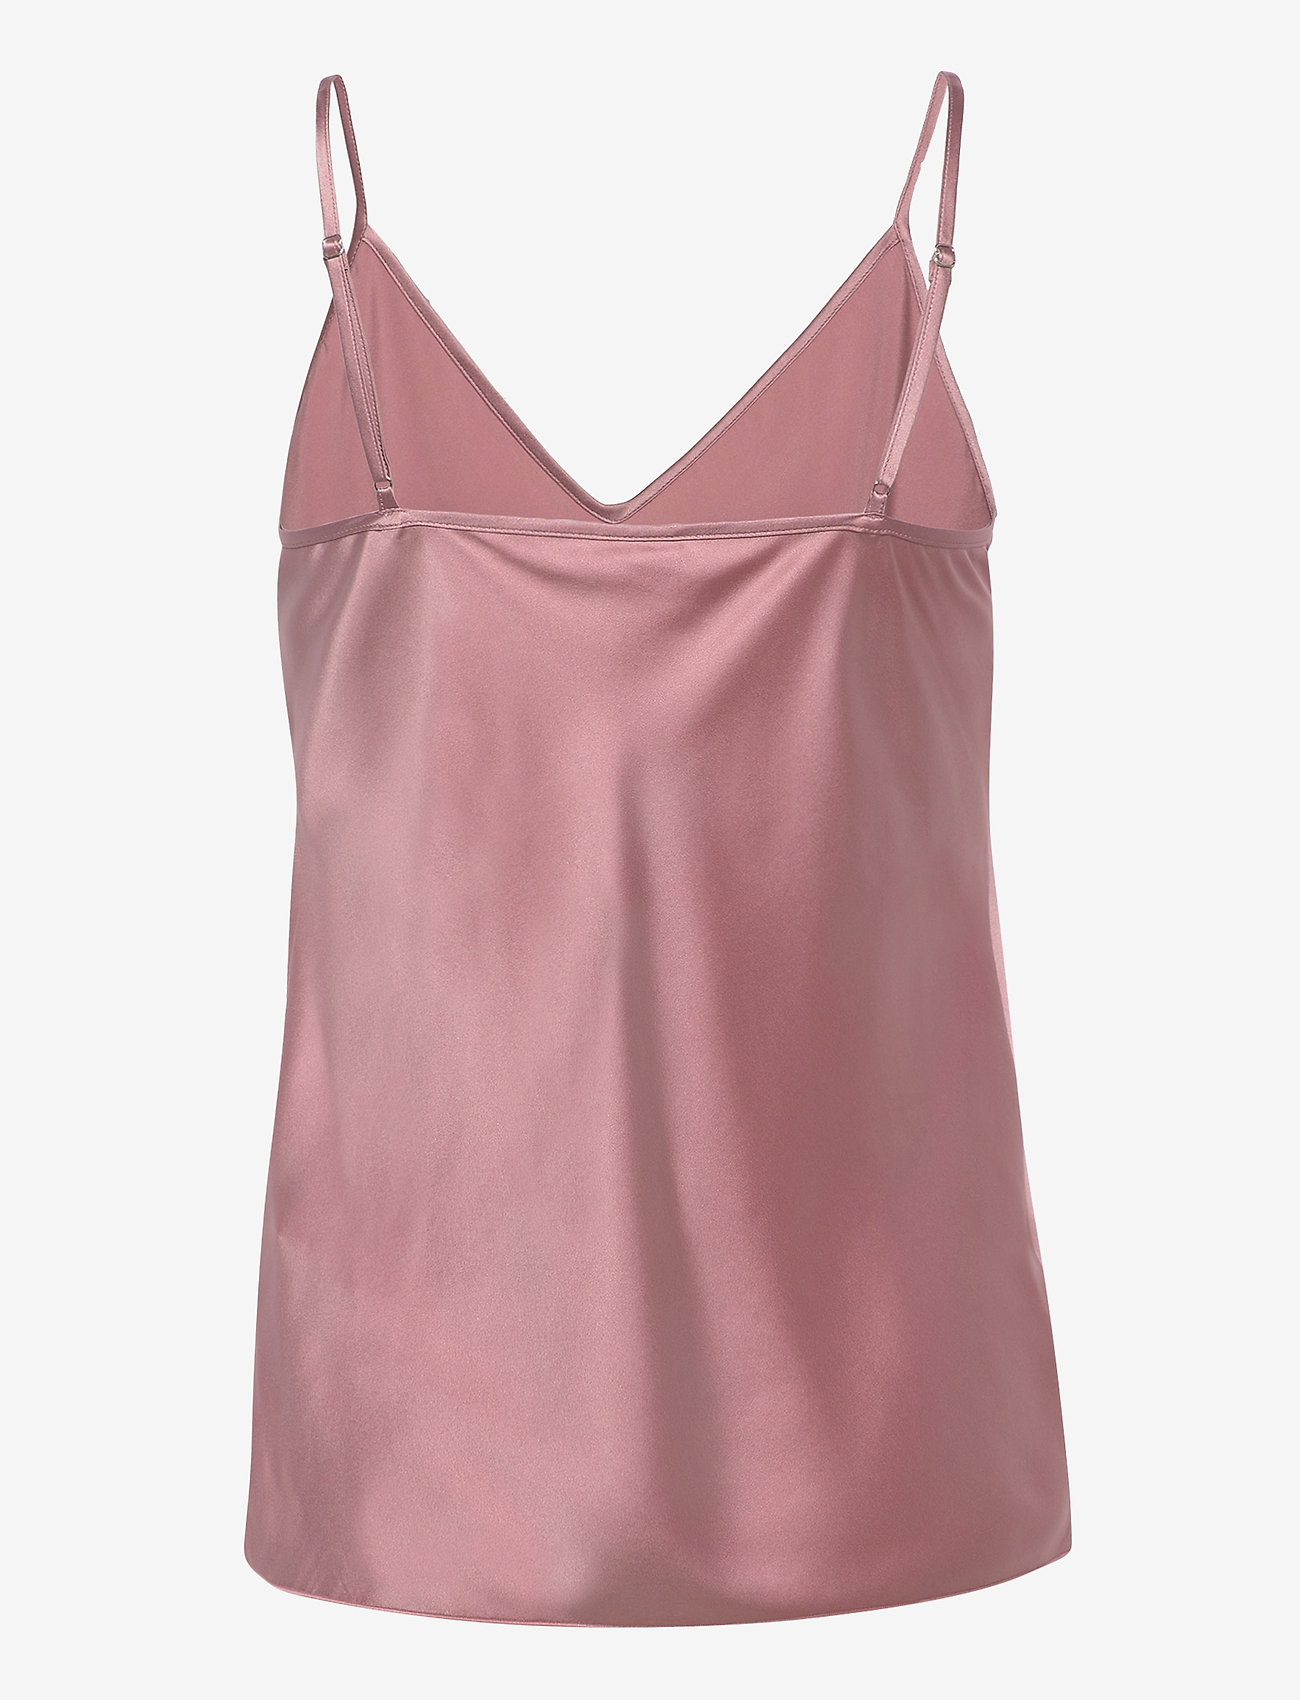 Max Mara Leisure - LUCCA - sleeveless blouses - pink - 1